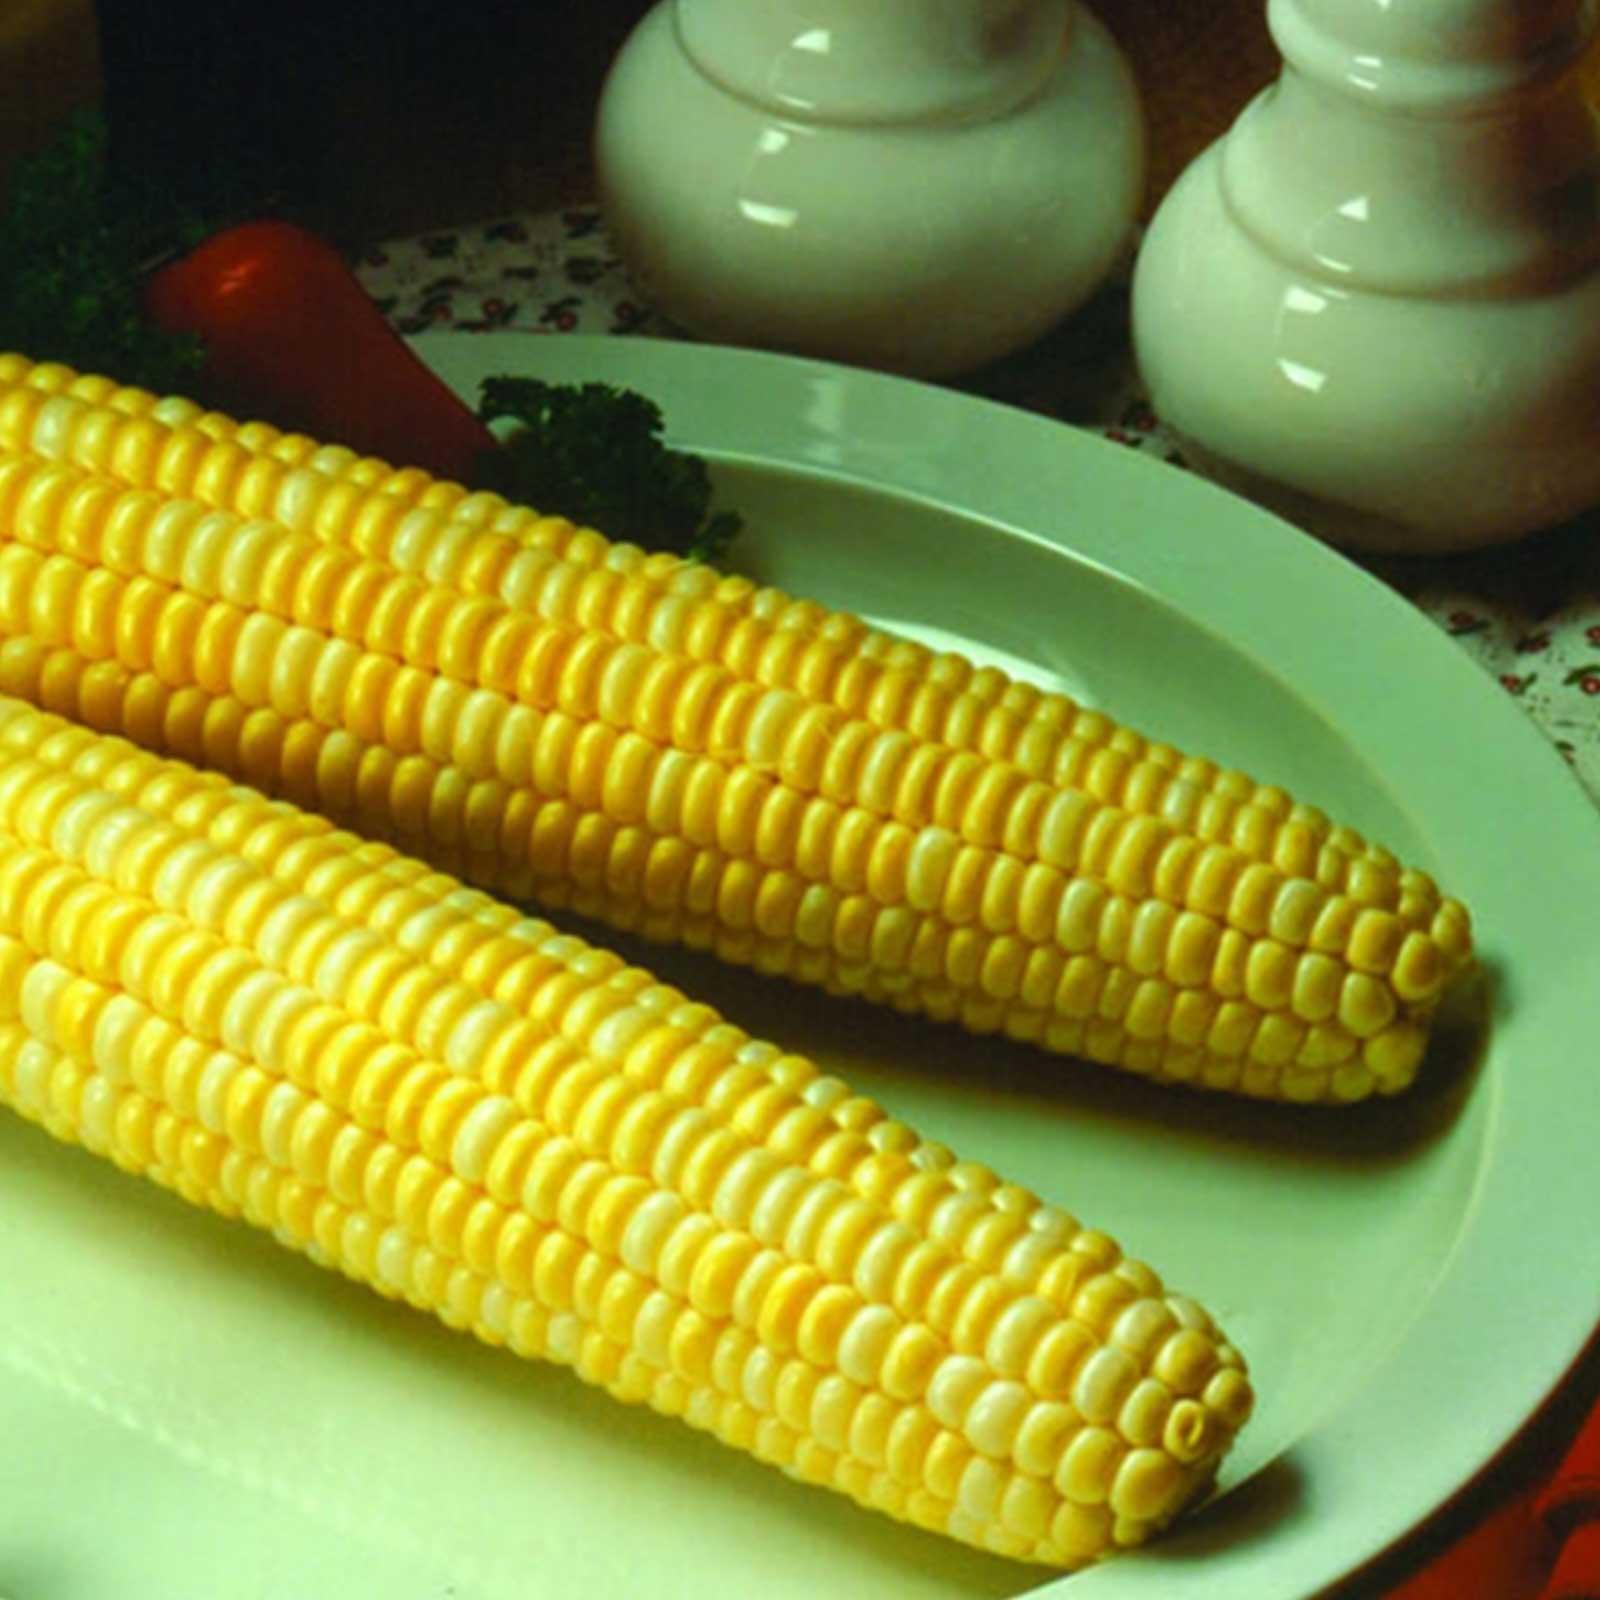 KANDY KORN HYBRID CORN GARDEN SEEDS NON-GMO VEGETABLE GARDENING YELLOW SWEET